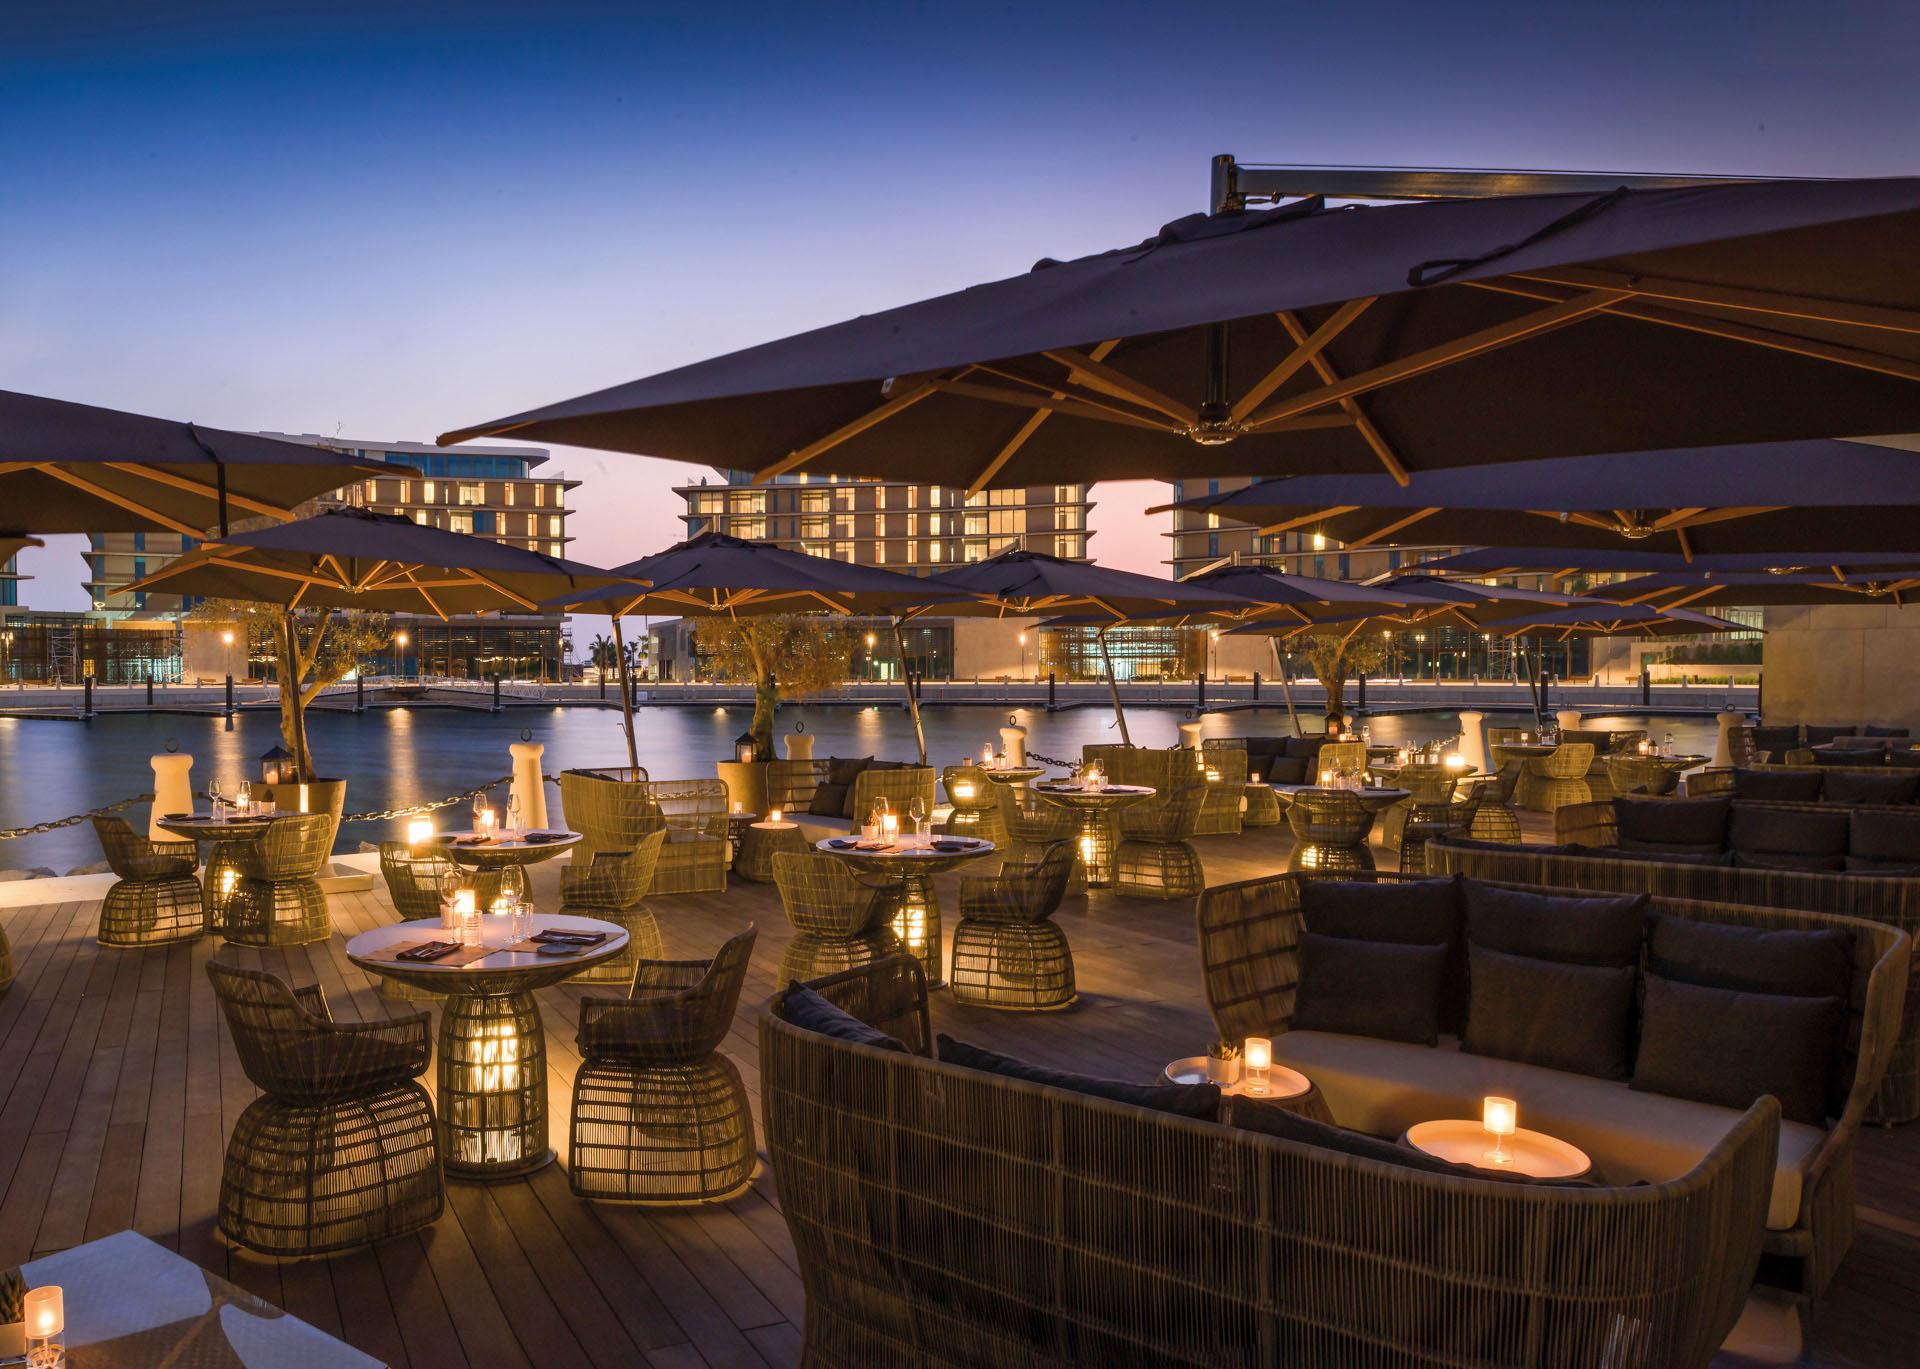 Bvlgari Resort Dubai - Il Cafè Terrace